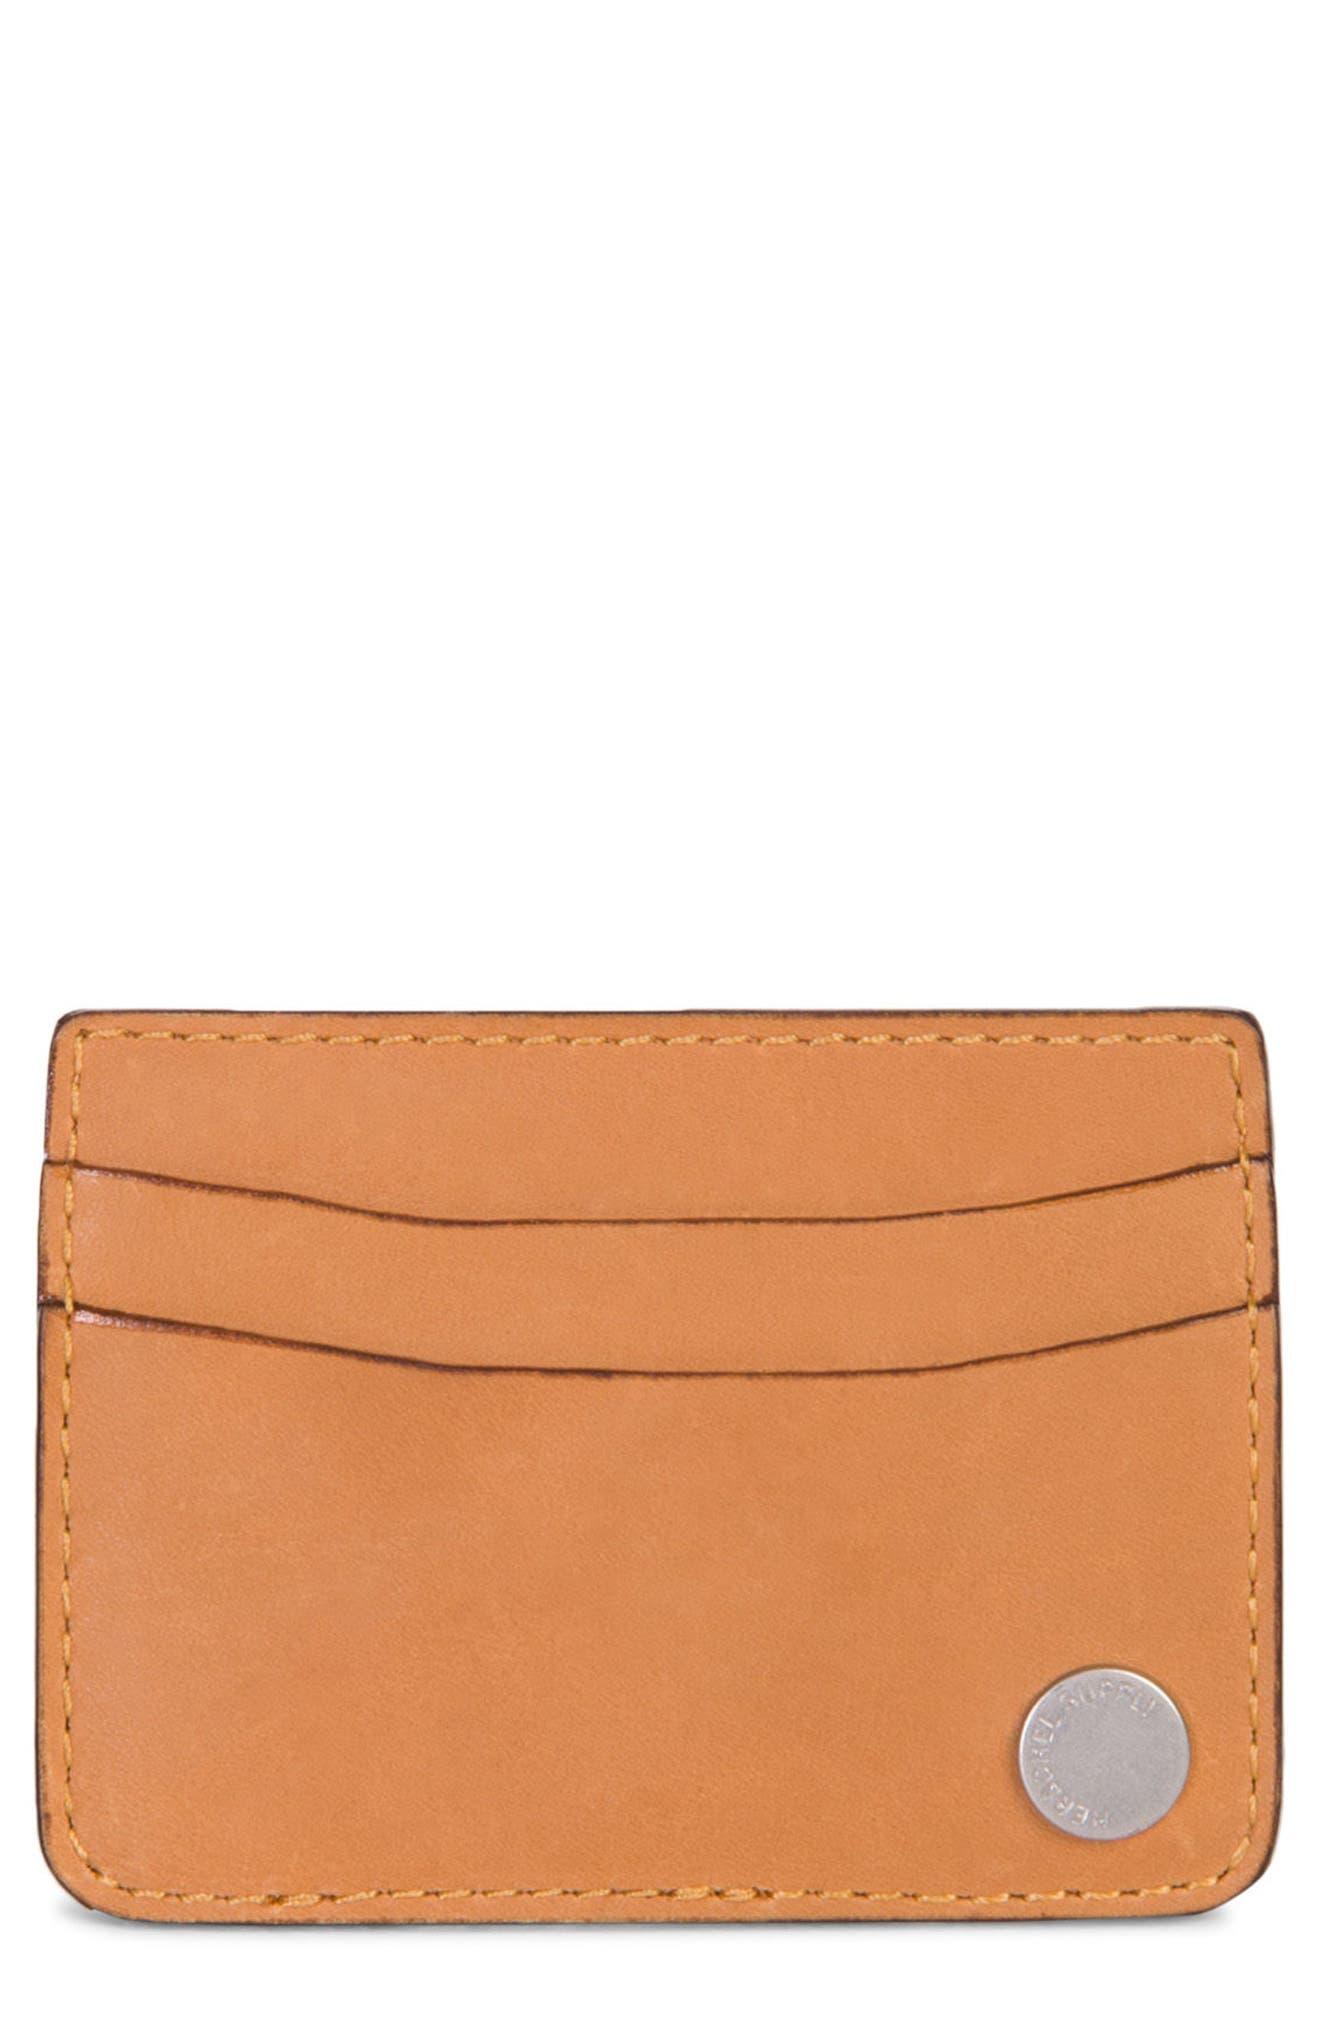 Ace Leather Card Case,                             Main thumbnail 1, color,                             Tan